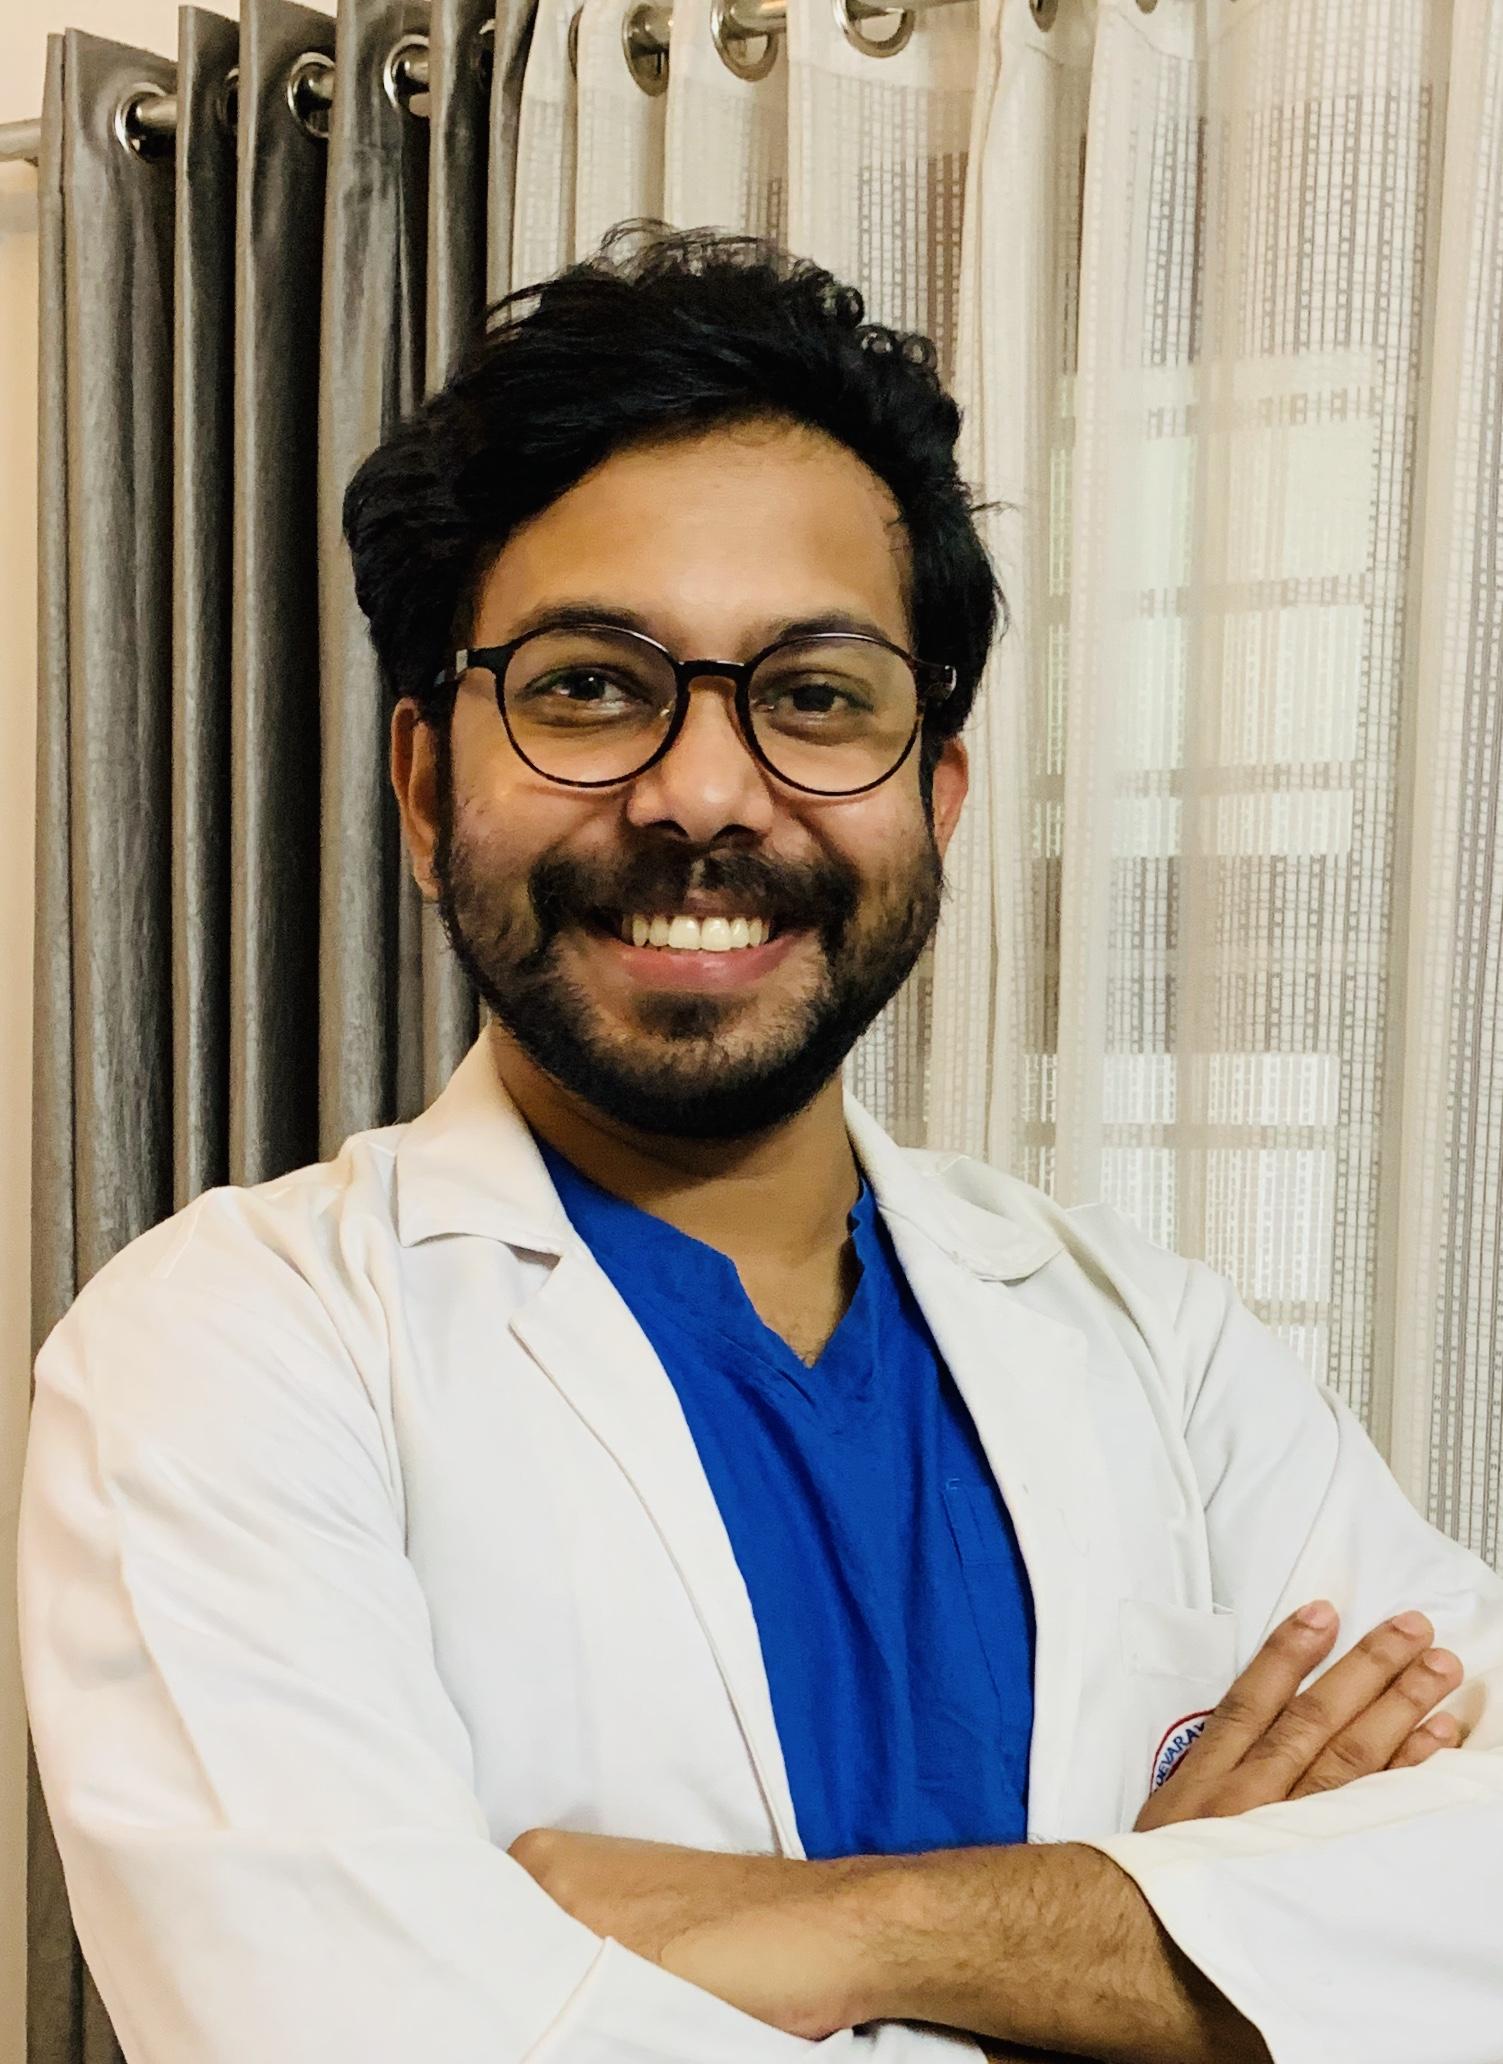 Dr. Akhil K Padmanabhan